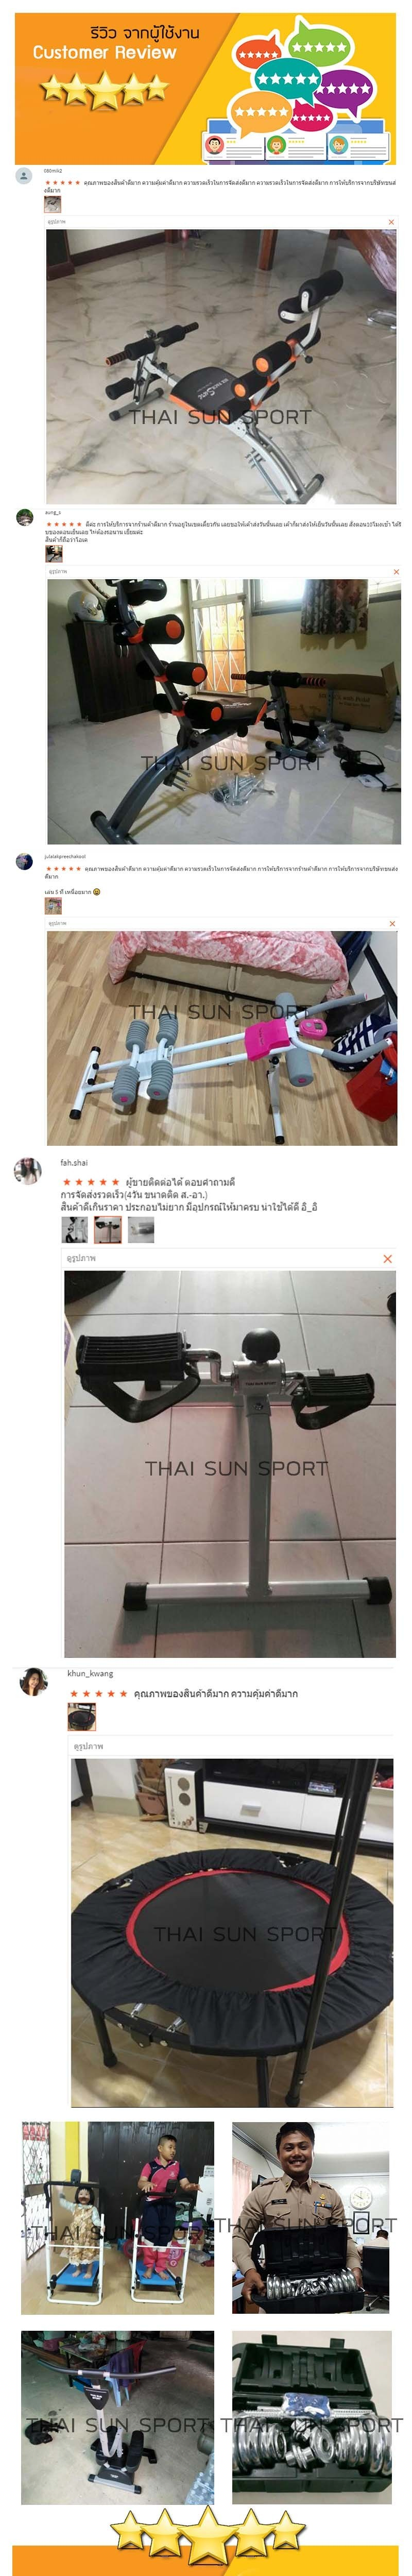 review สินค้า Thai sun sport